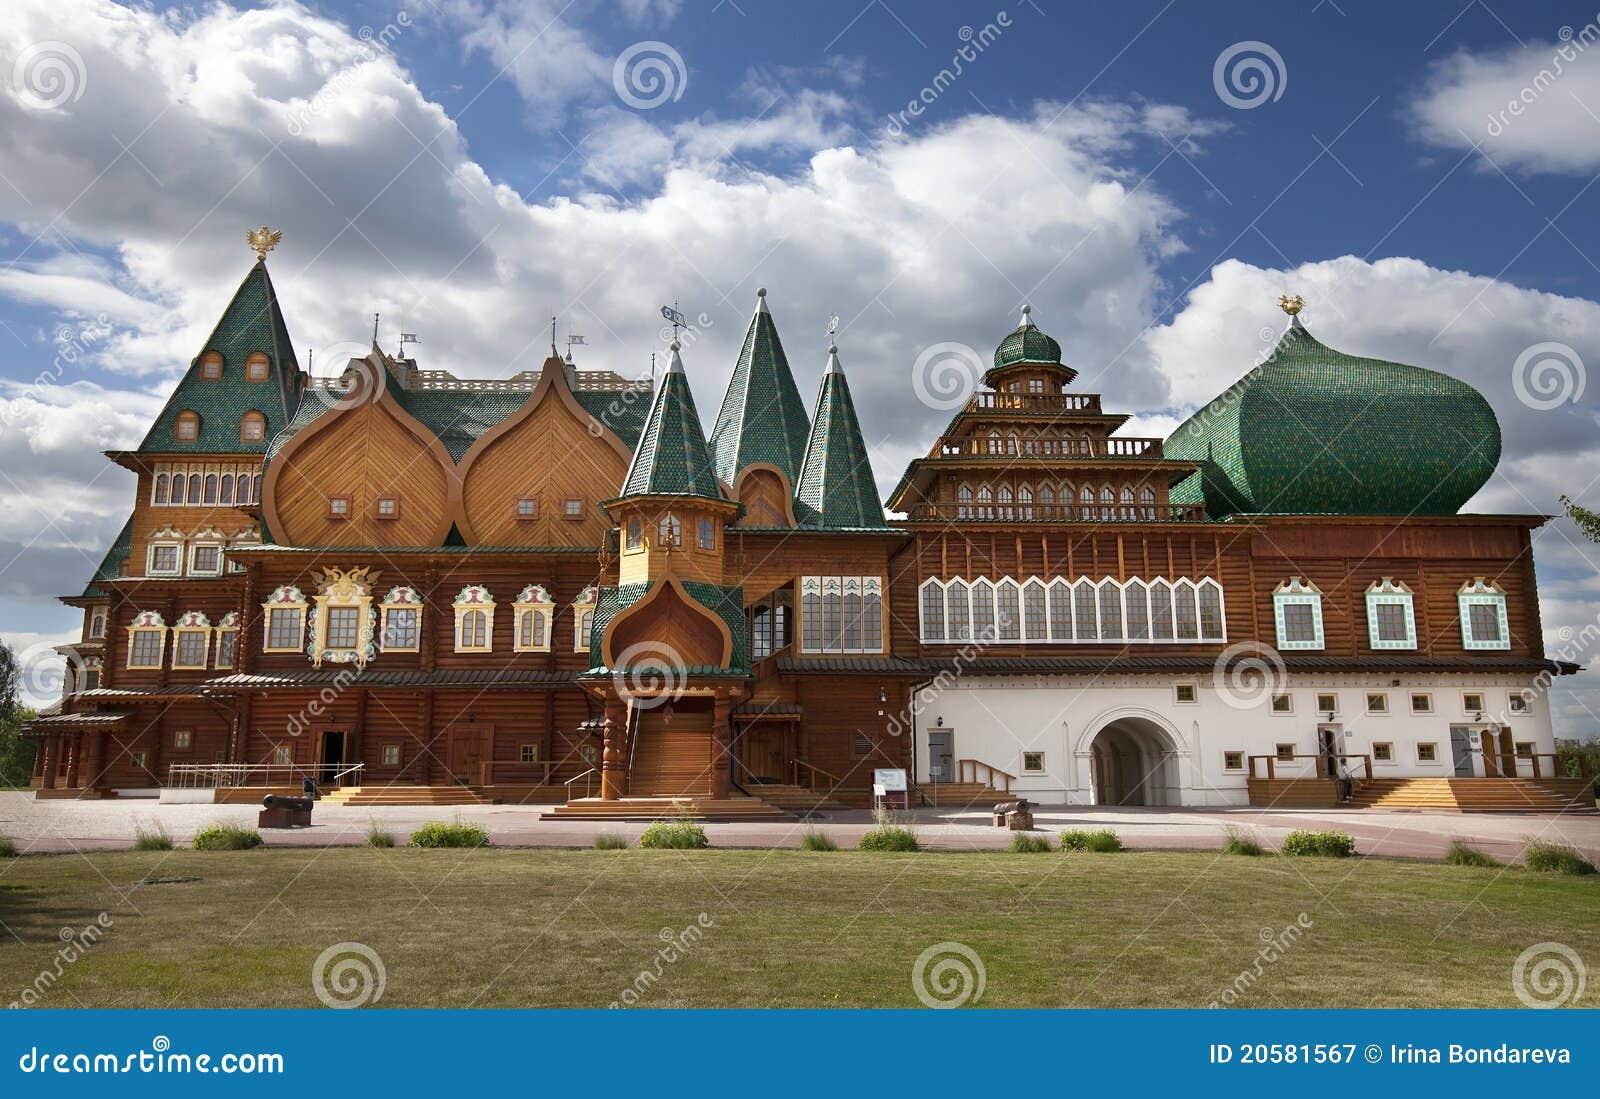 Palacio de madera en Moscú